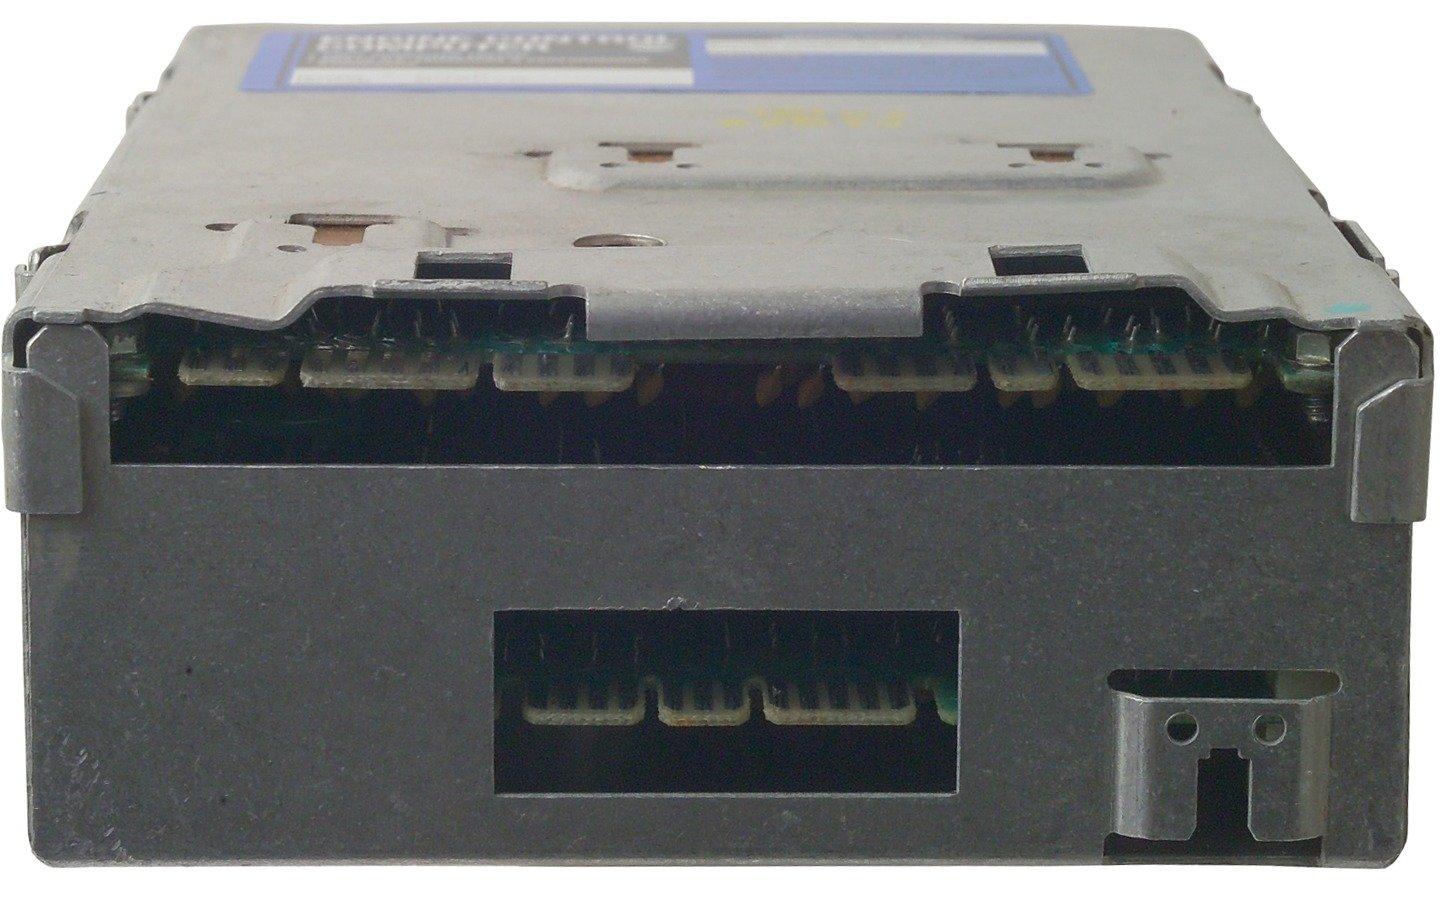 Cardone 77-6028 Remanufactured General Motors Computer A1 Cardone 776028AAF